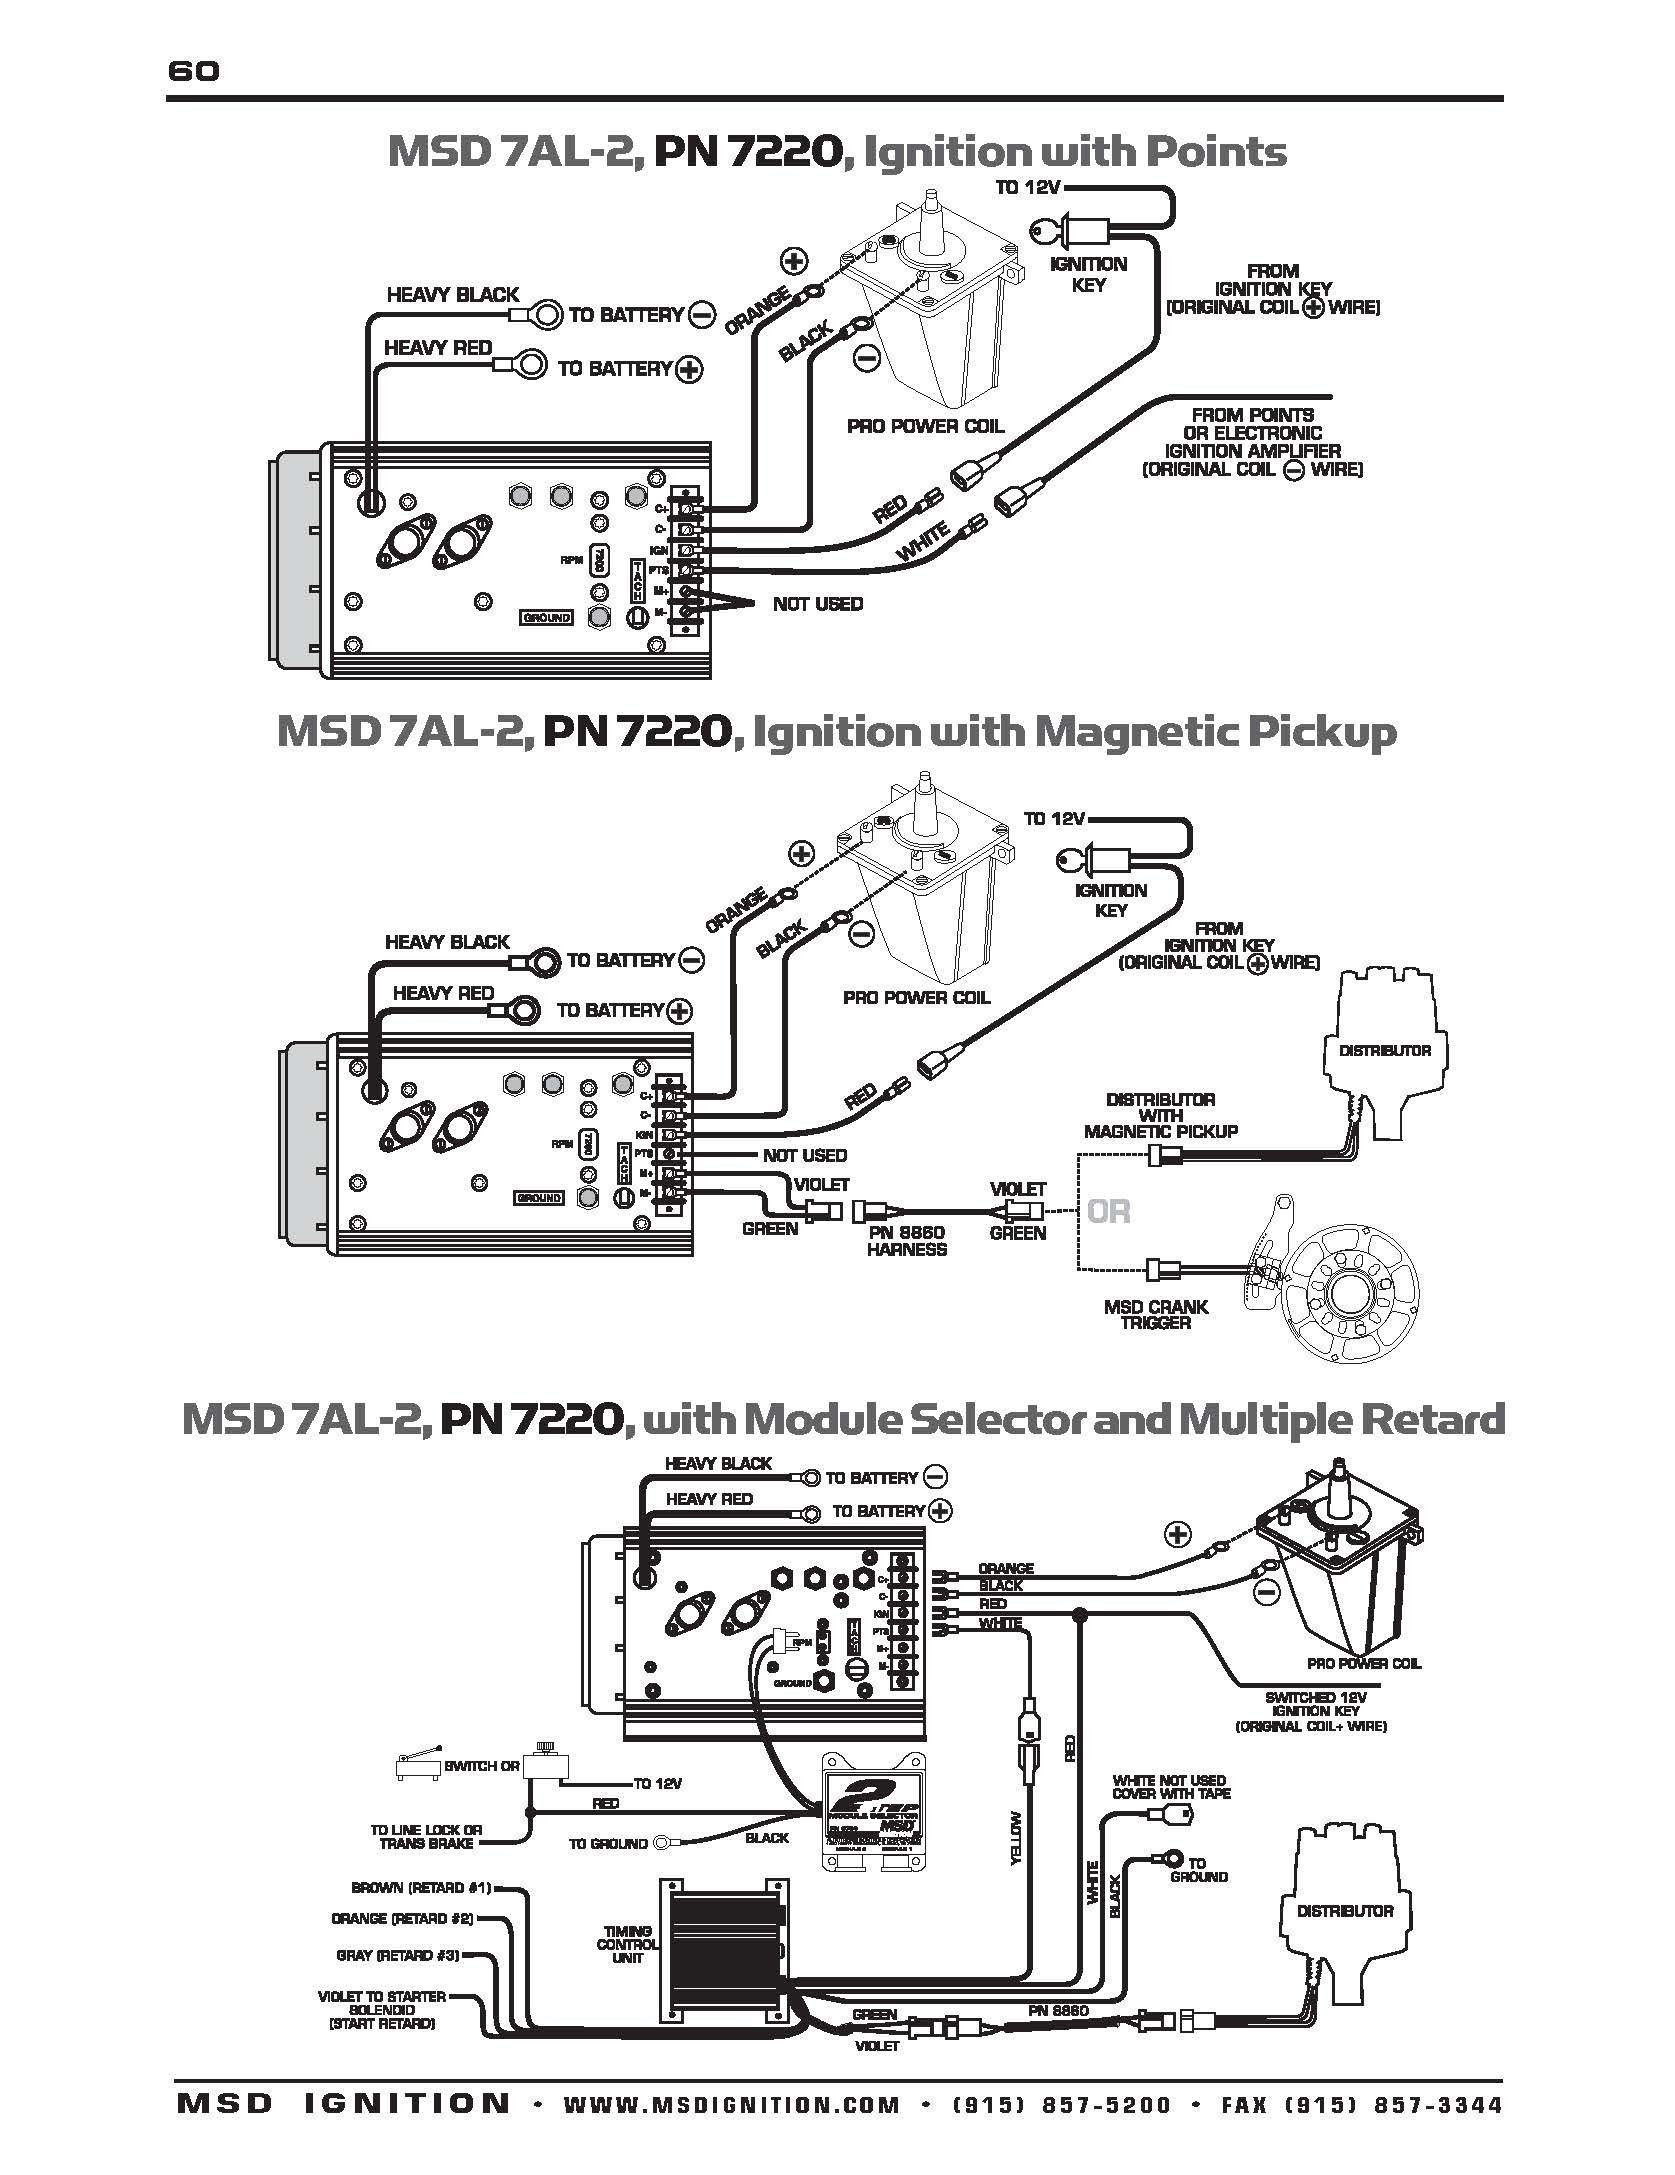 Msd Ignition 6al Wiring Diagram Mopar Hei Chevy Ford Box